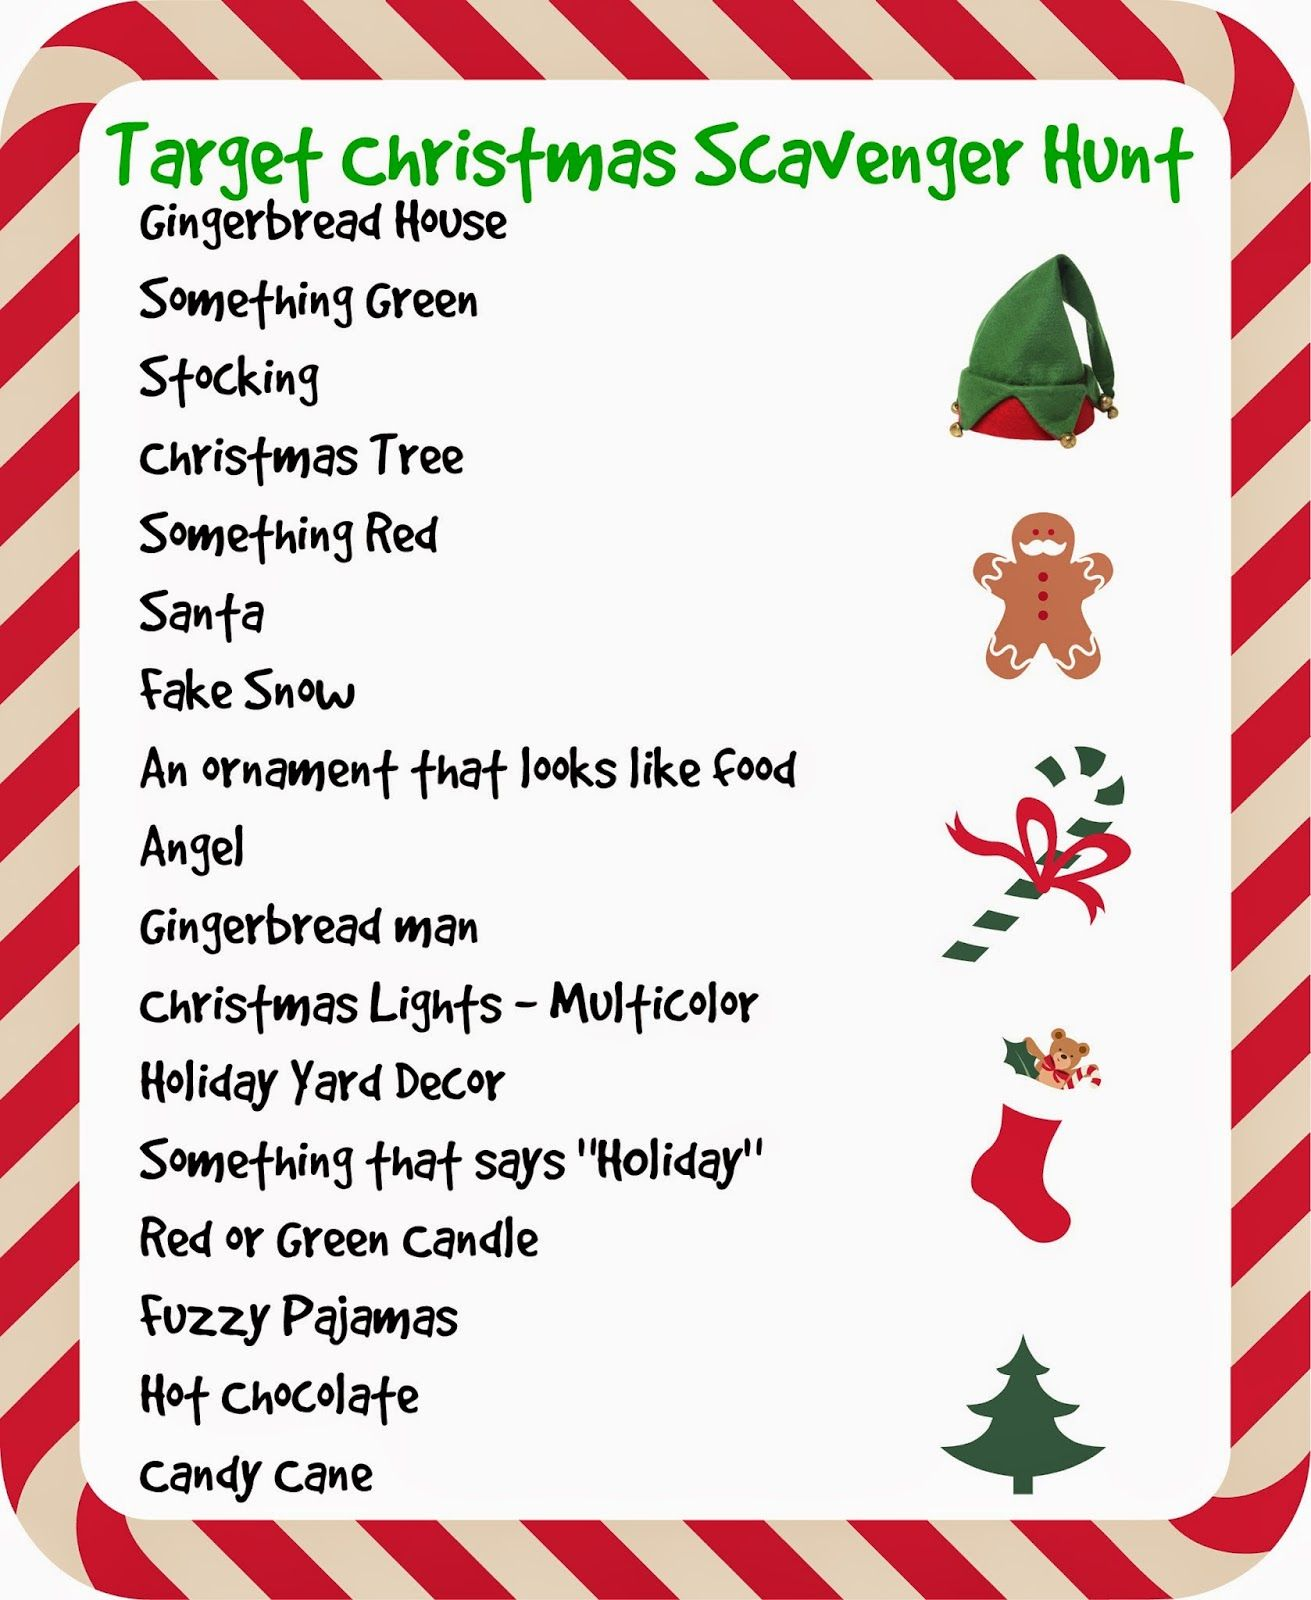 Target Store Christmas Scavenger Hunt Christmas Lights I